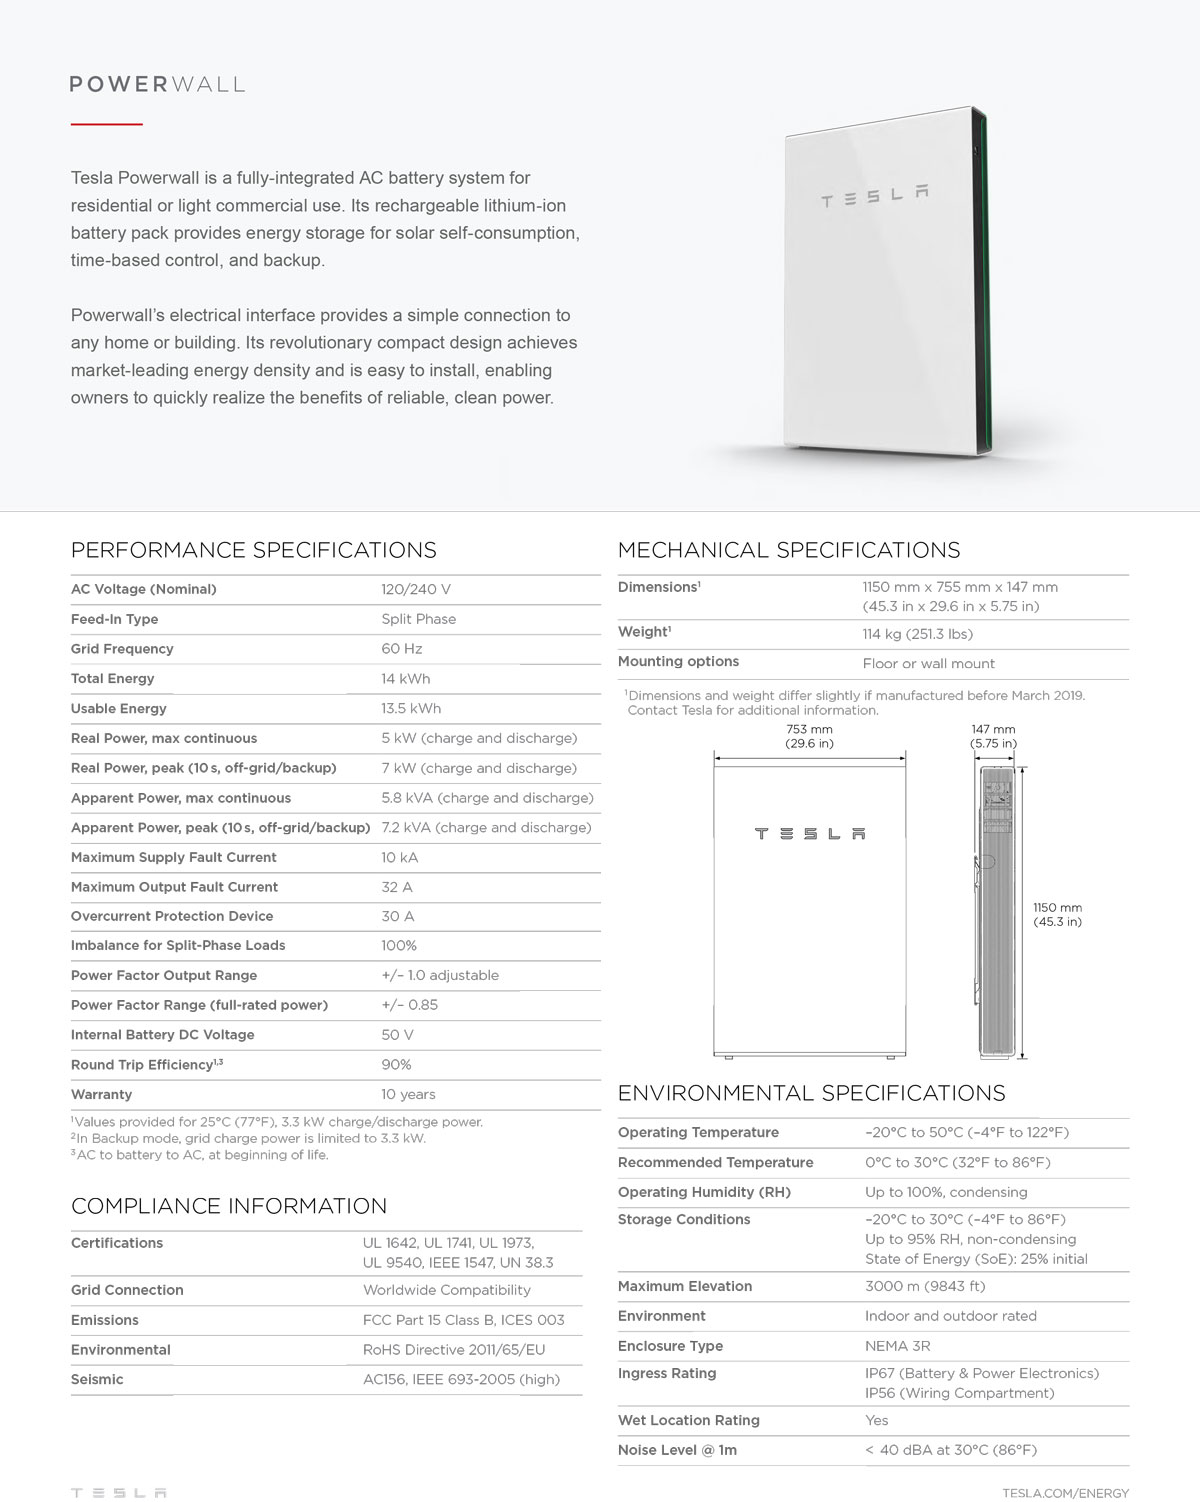 Pin Tesla Powerwall 2 Datasheet - North America